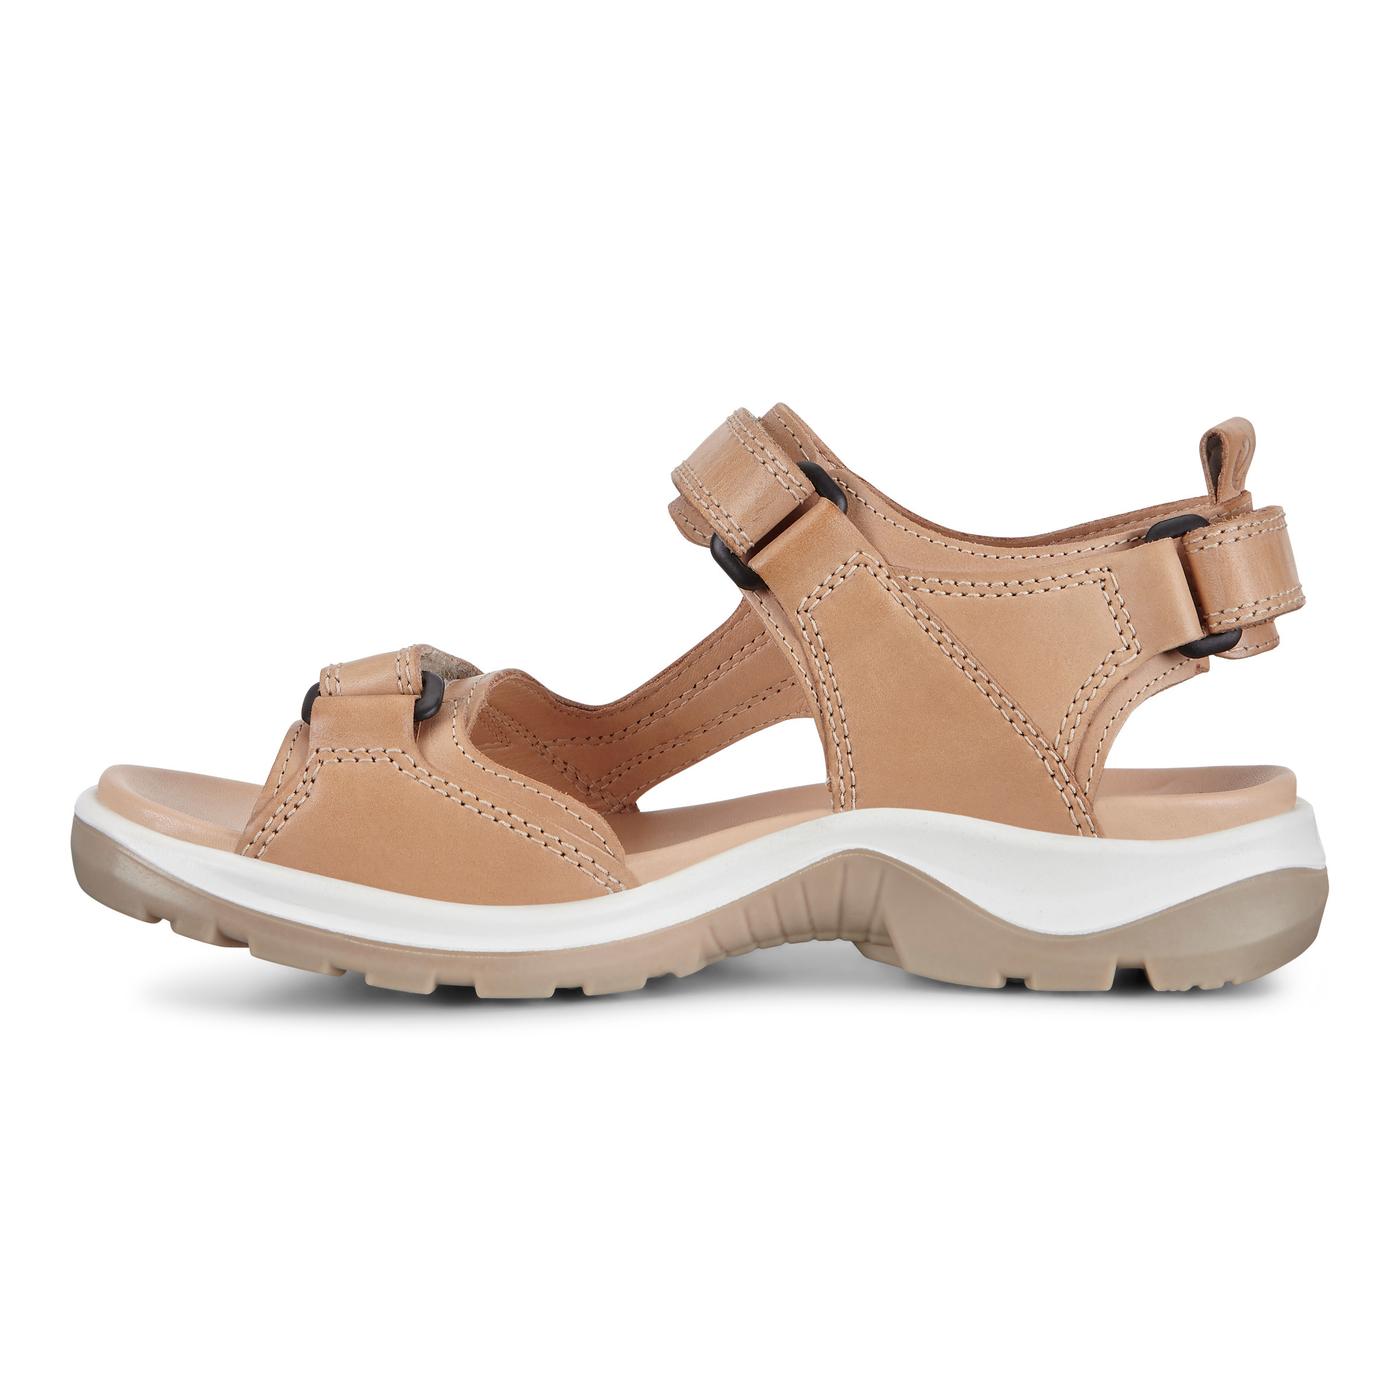 ECCO Womens Offroad 2.0 Sandal